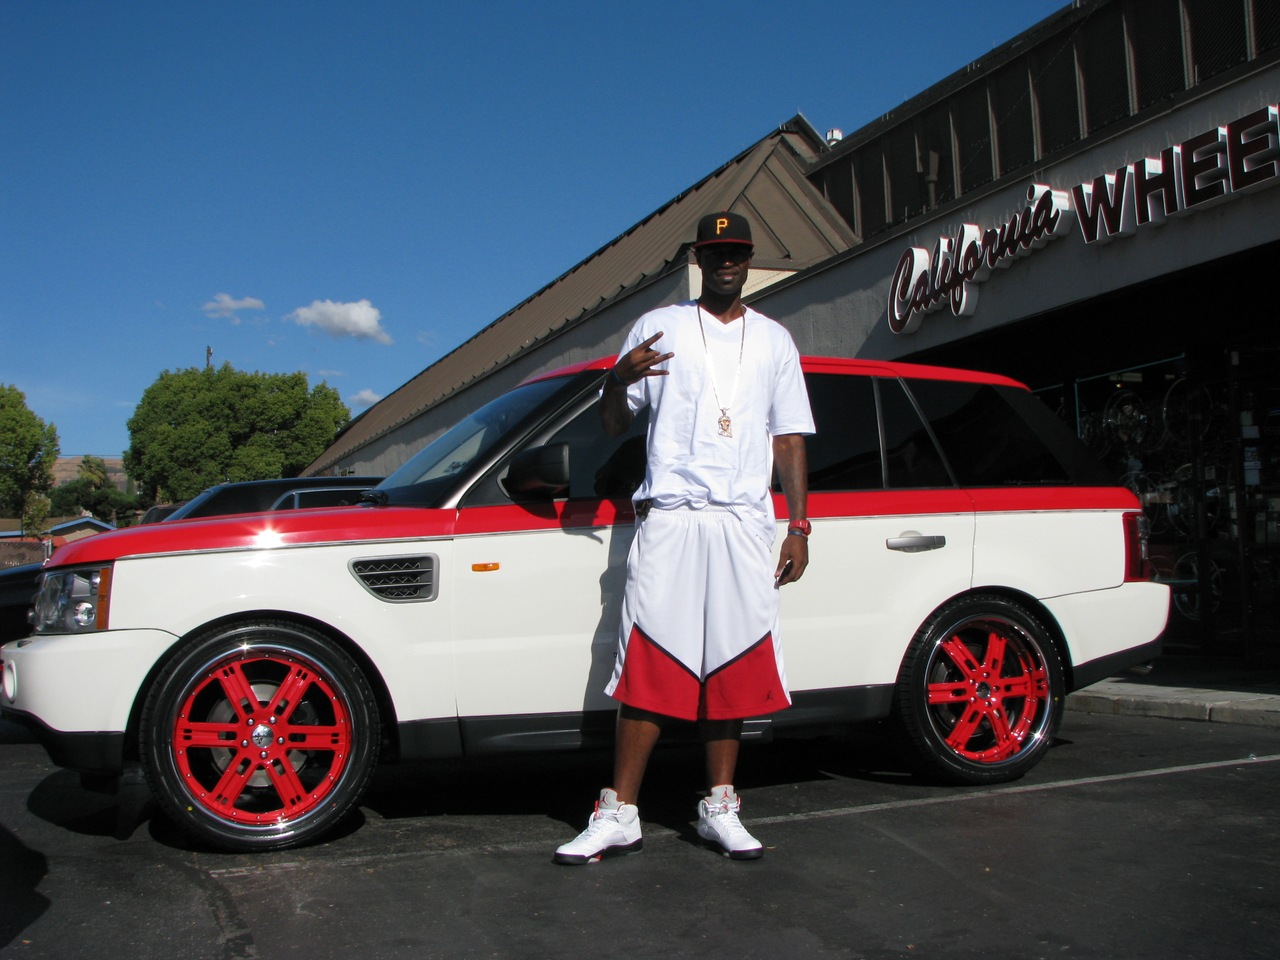 Stephen Jackson's Red Range Rover